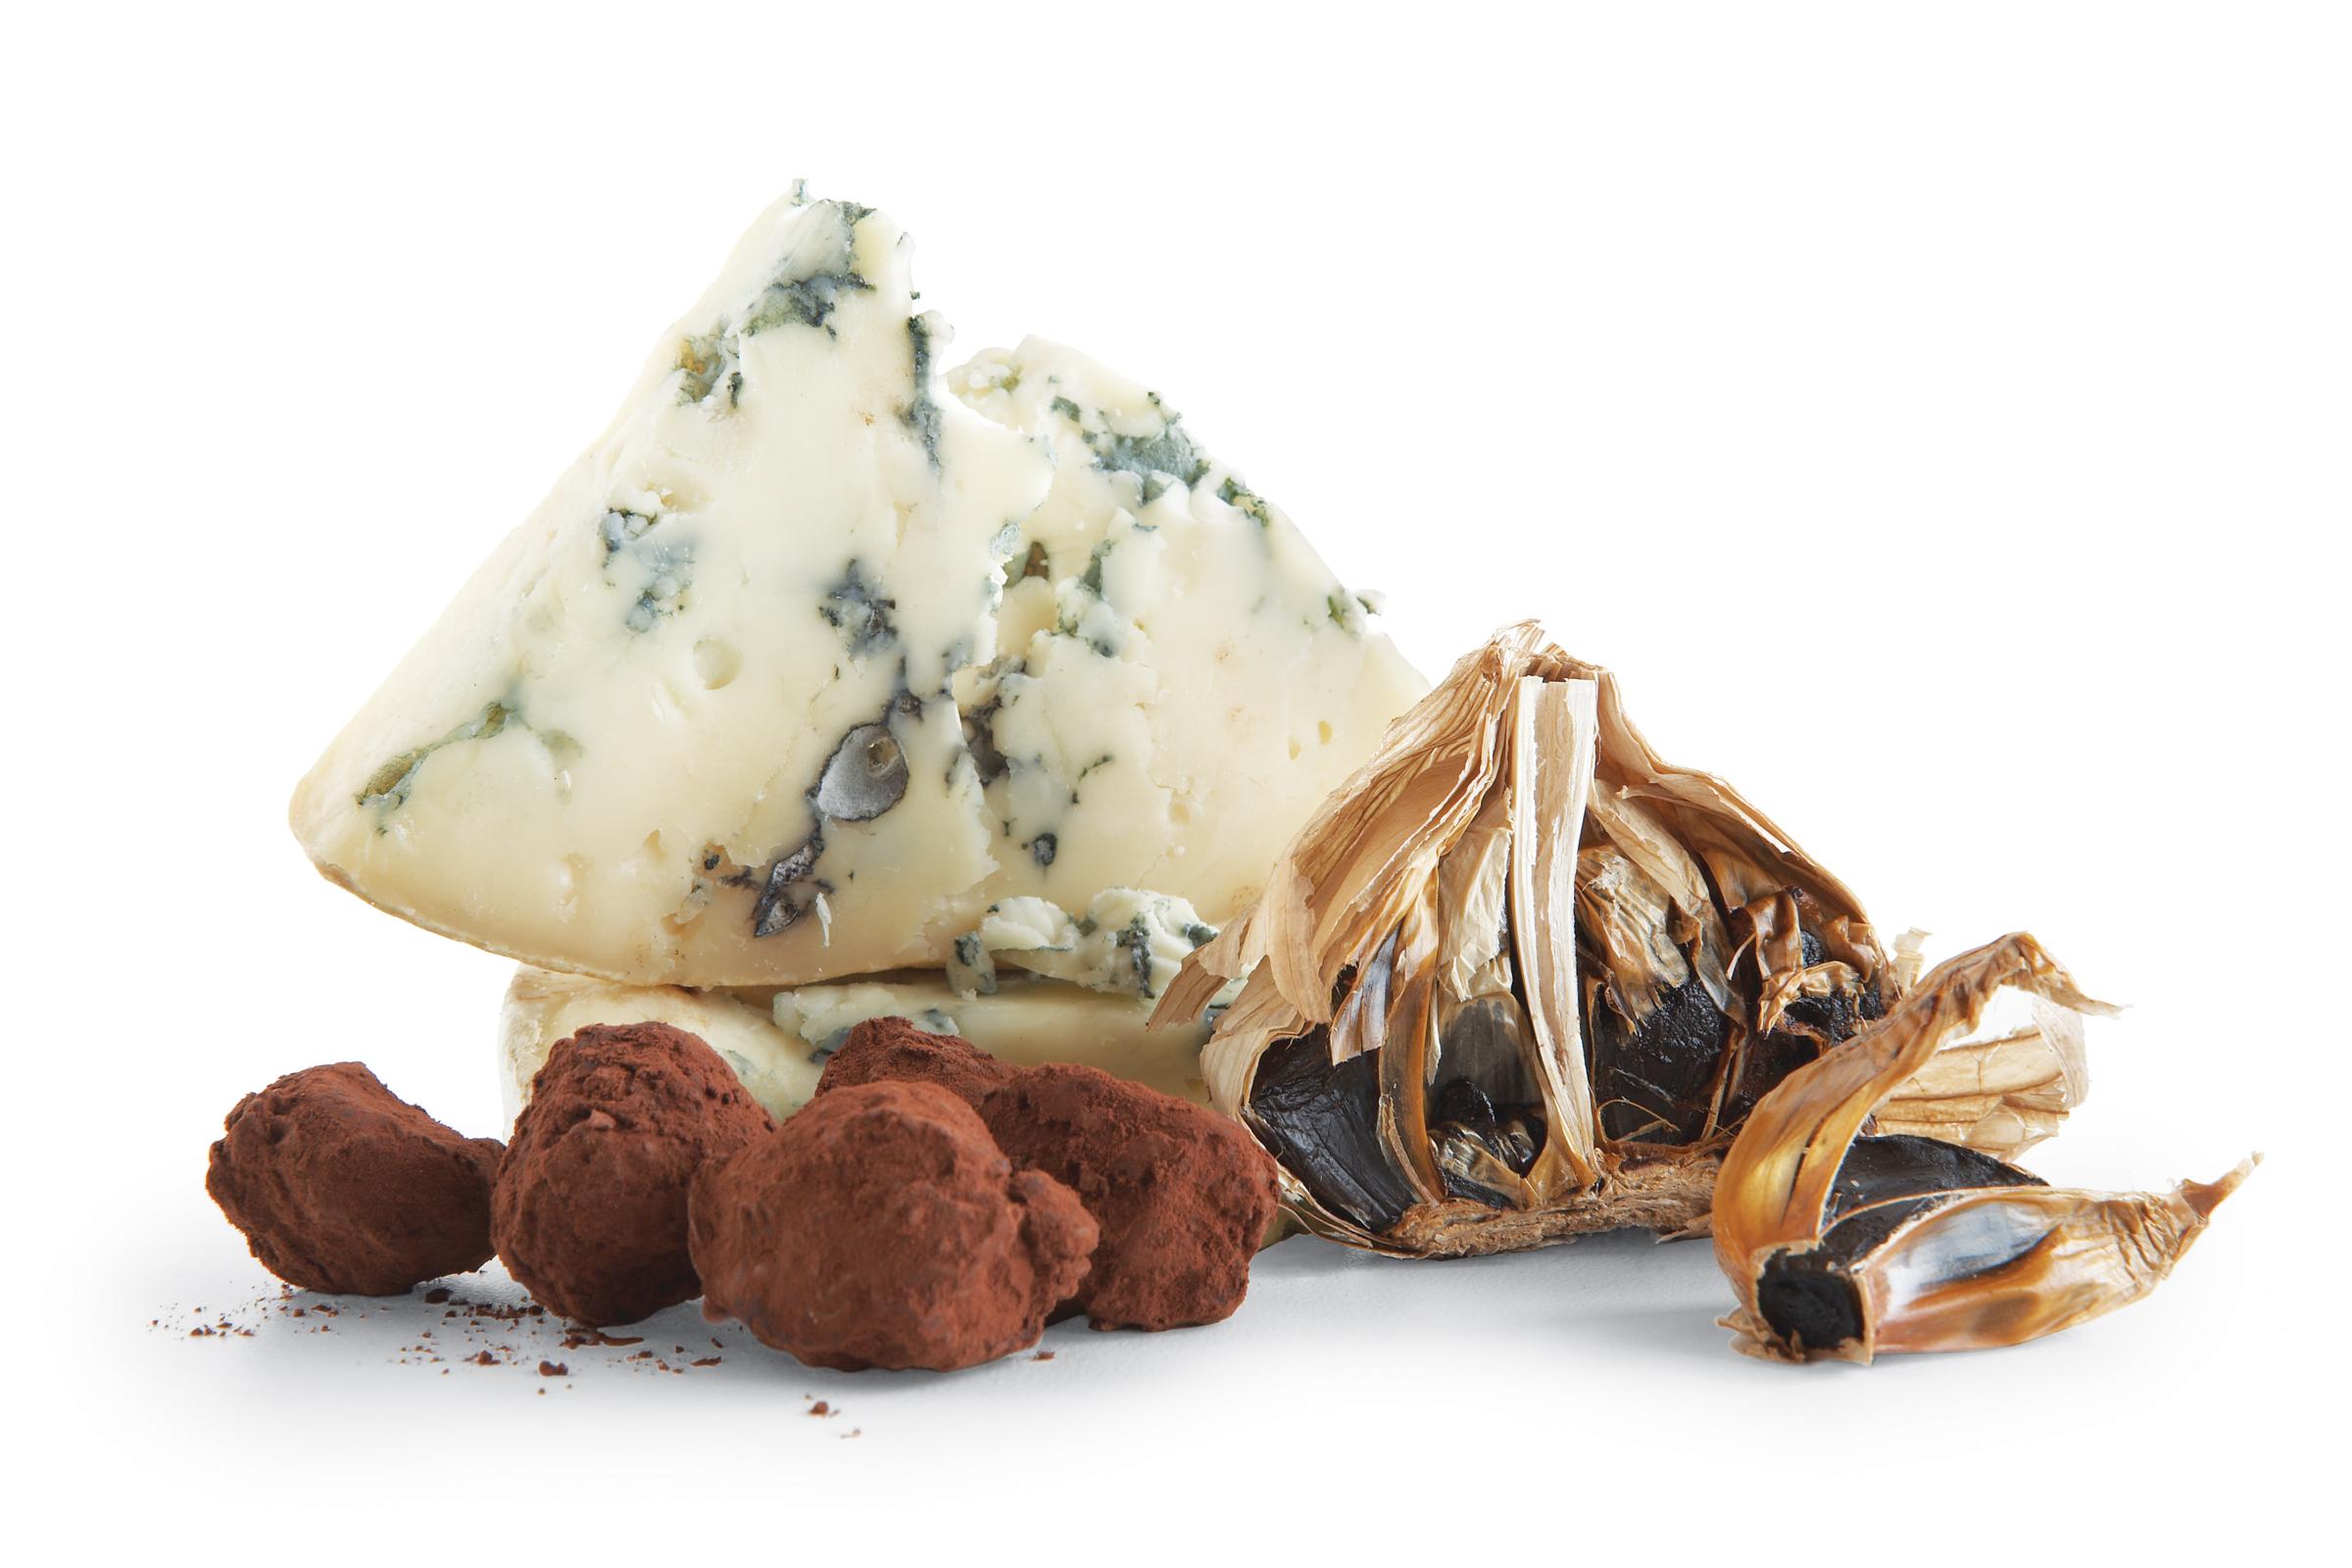 cheese+choc_fermented_05.jpg